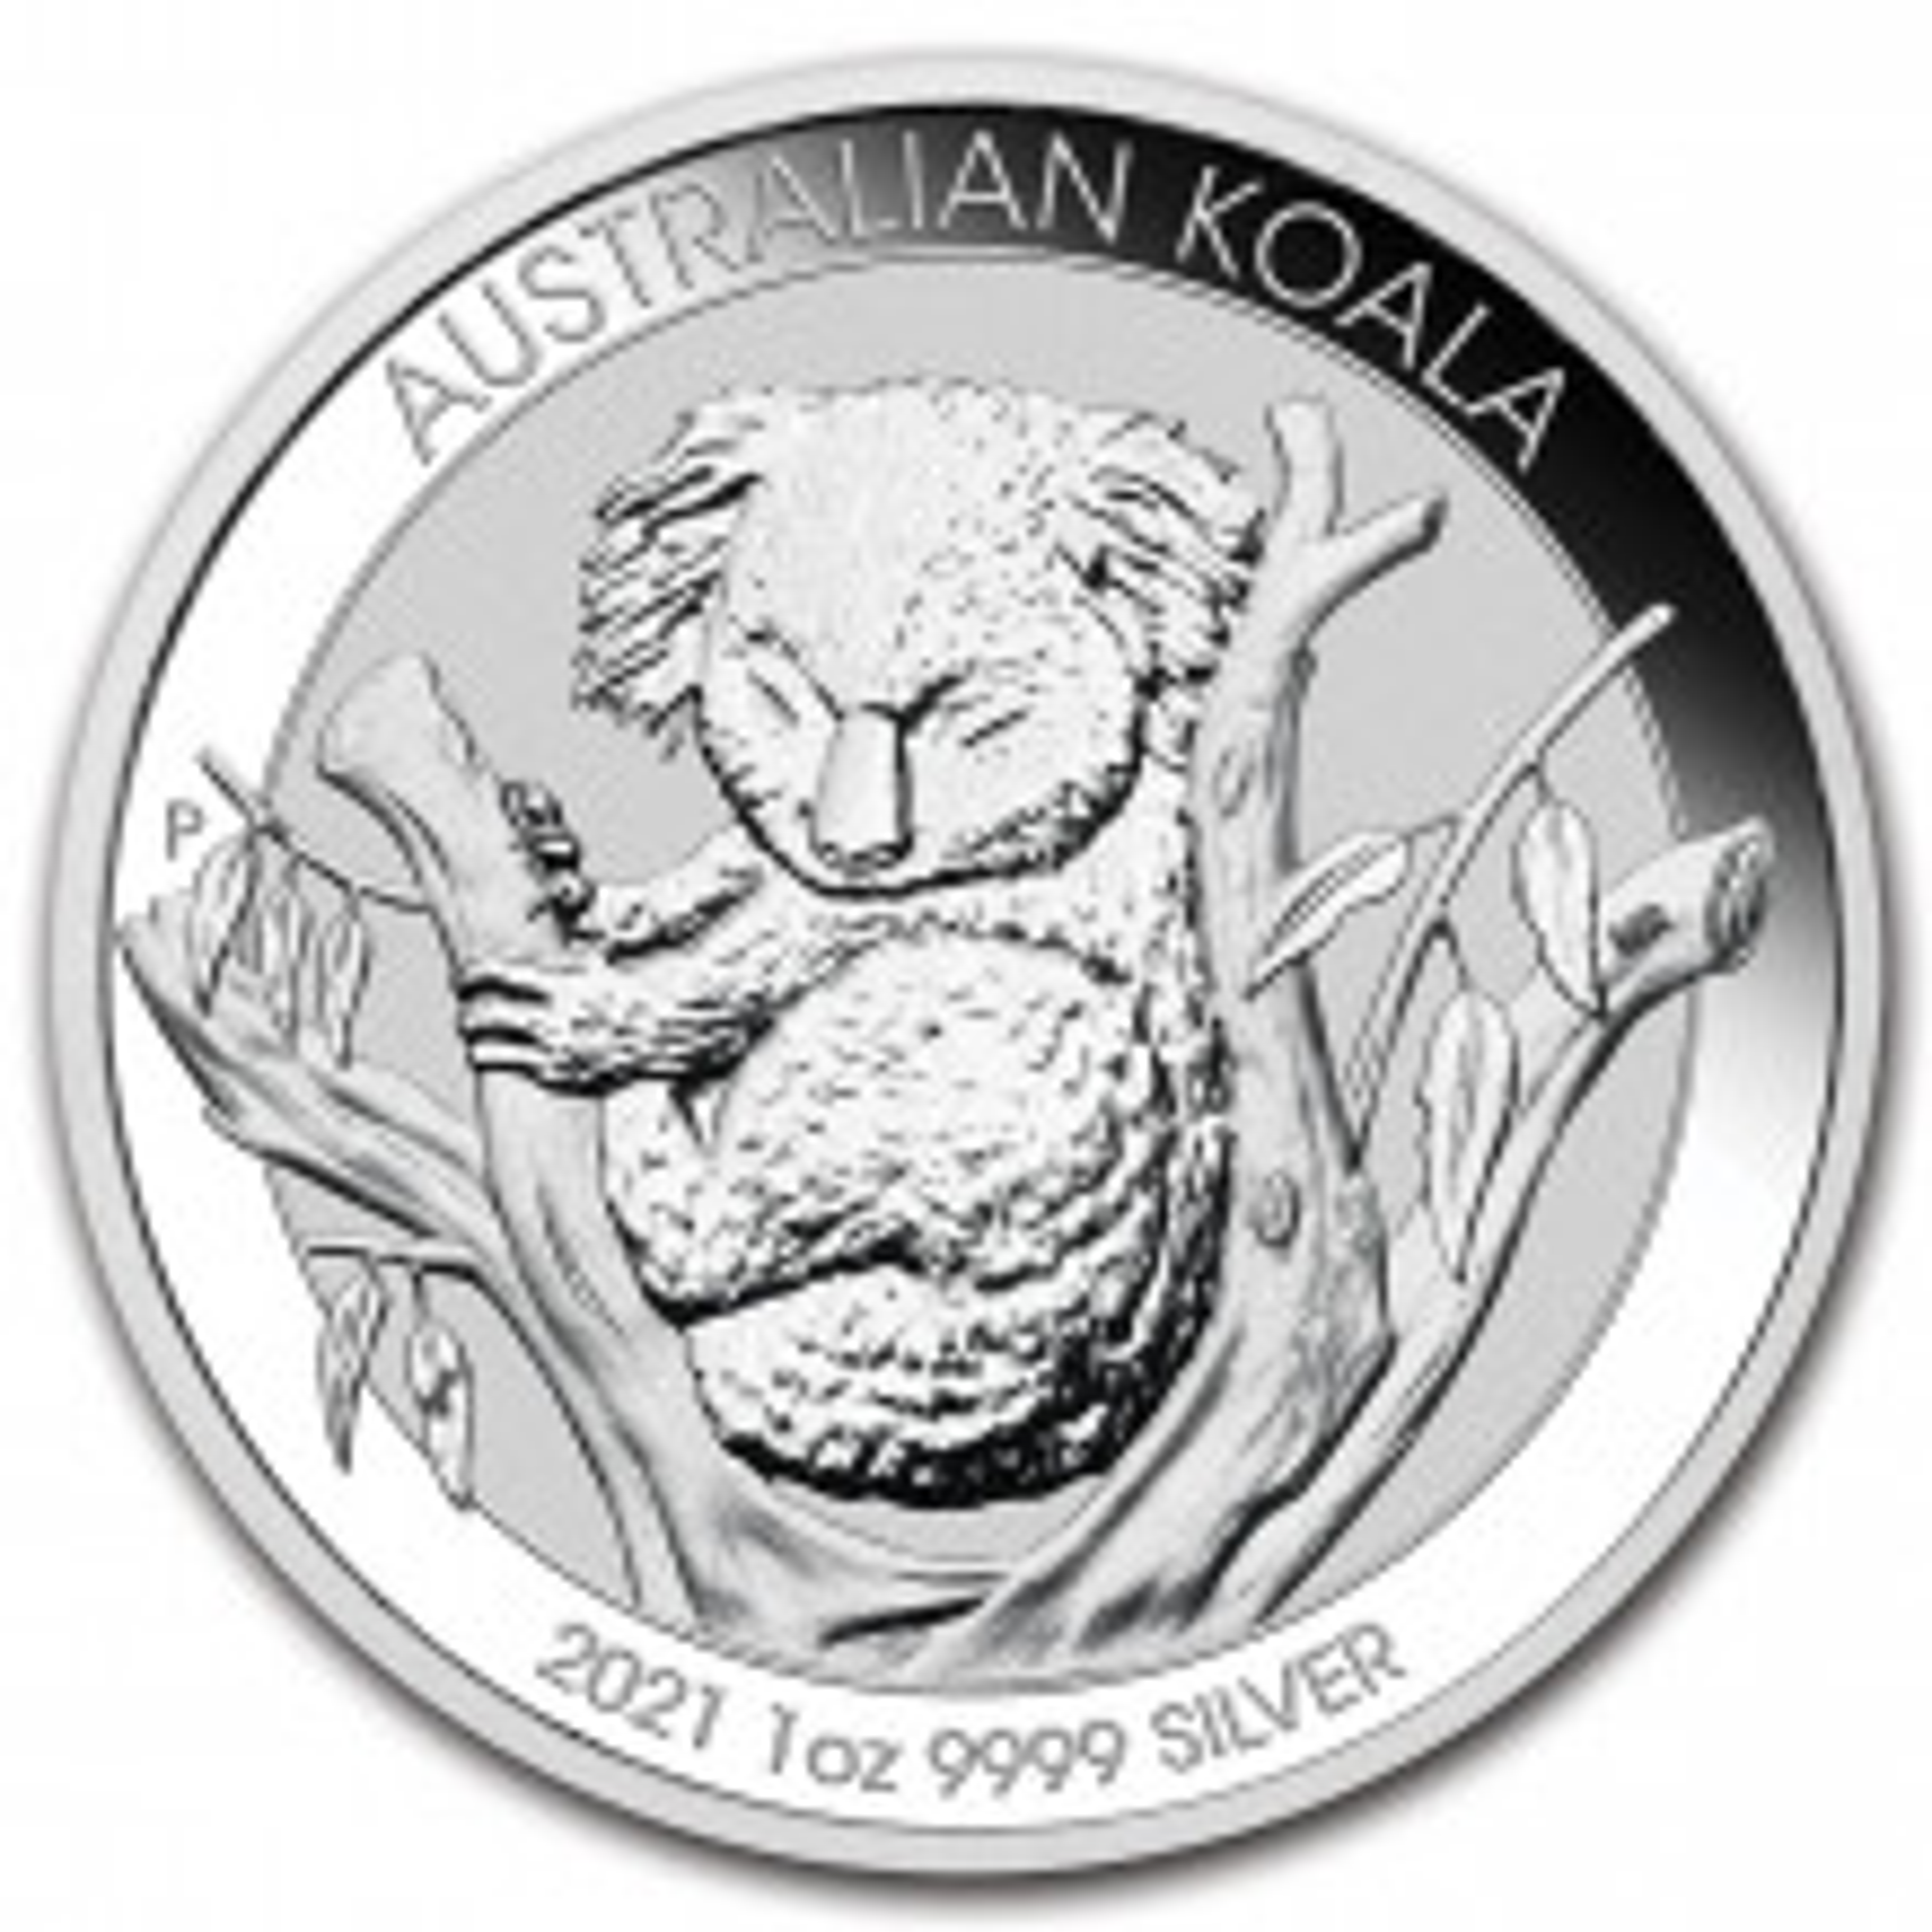 1 Troy ounce silver coin Koala 2021